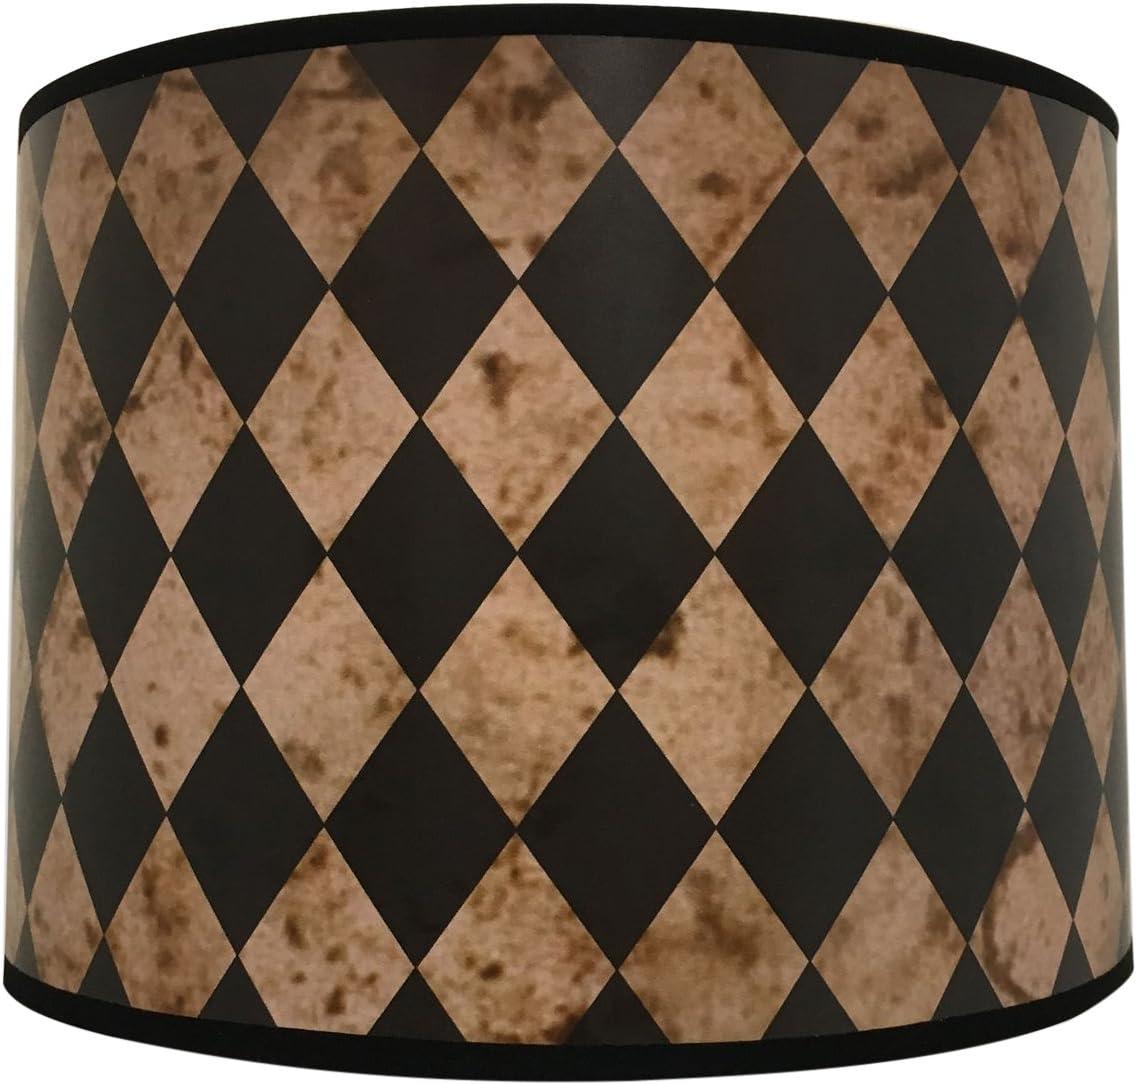 Royal Designs Modern Trendy 1 year warranty Decorative Lamp Handmade Sales results No. 1 - Mad Shade